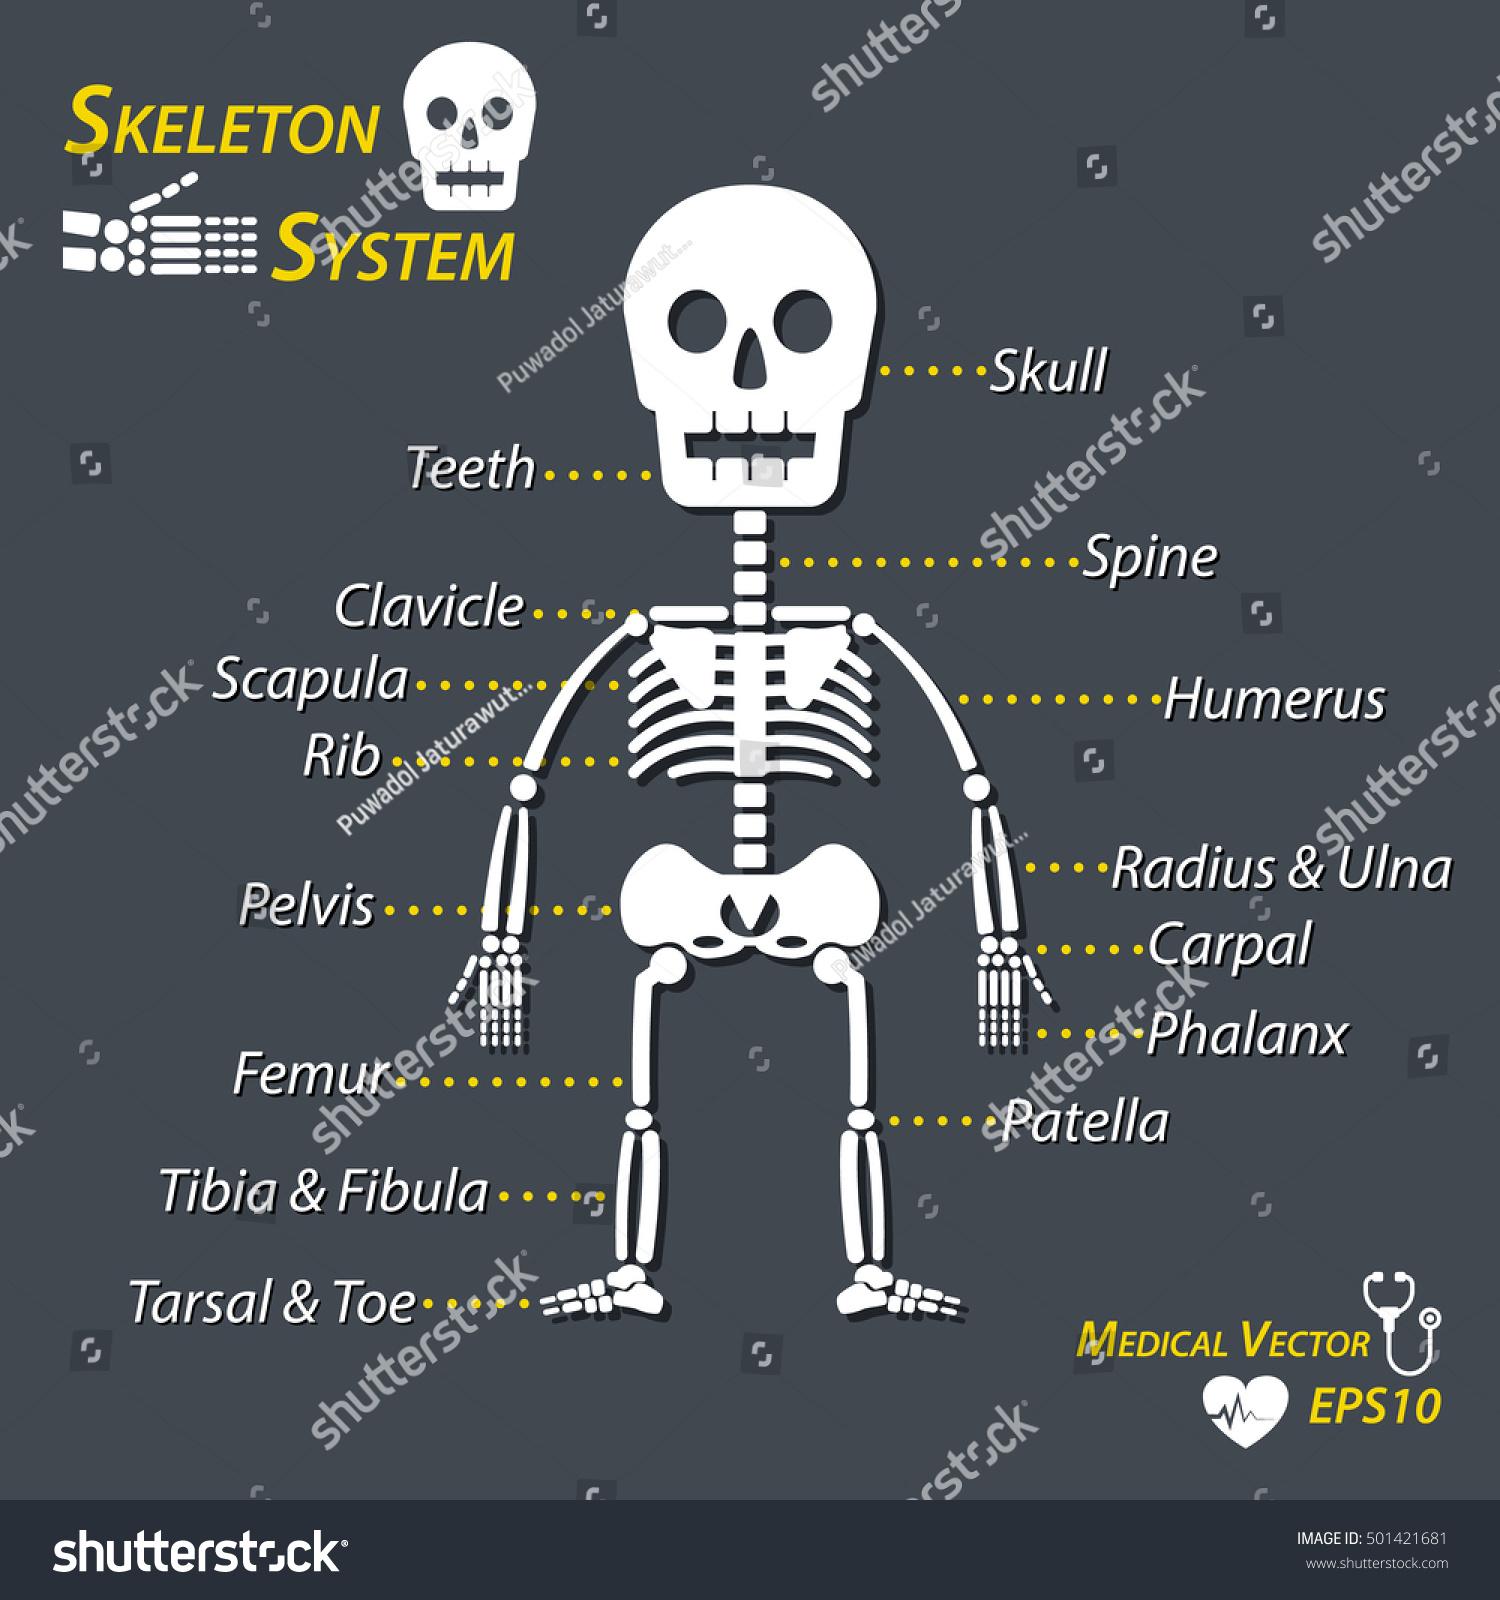 Human Skeleton And All Name Of Bone Stock Vector Illustration Shutterstock